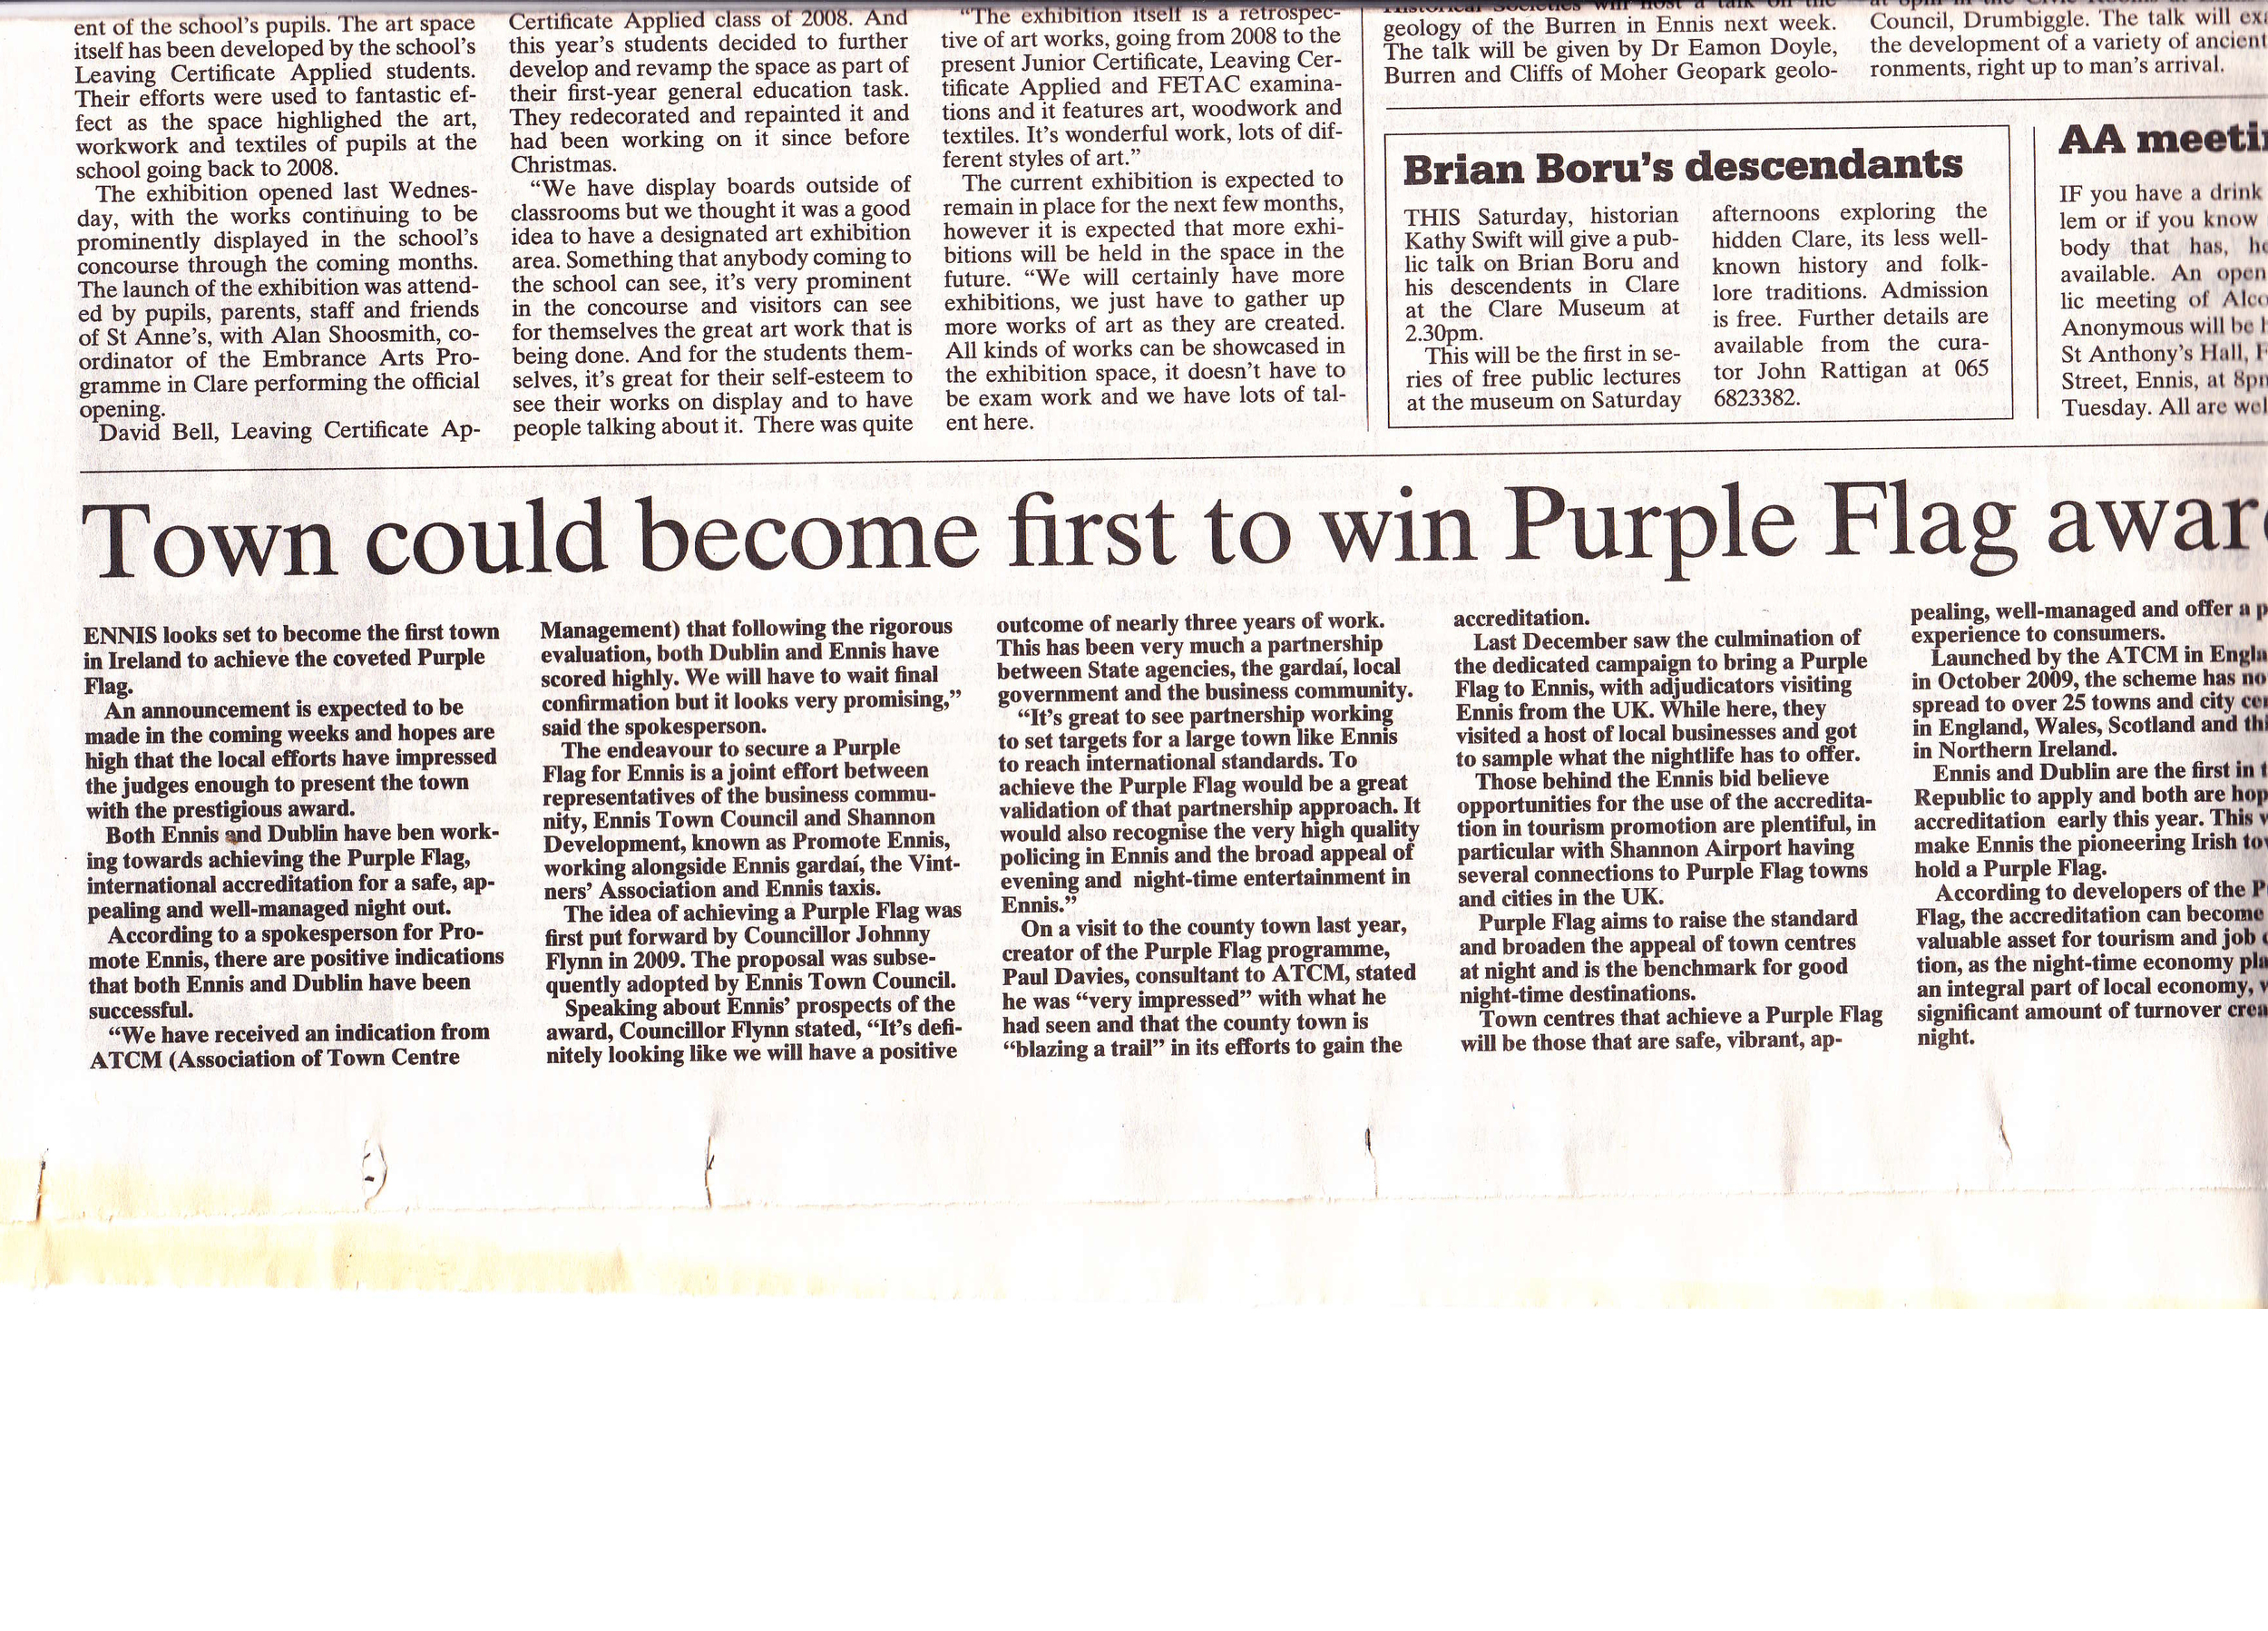 _0019_Purple Flag_TowncouldbeFirst.pdf.jpg